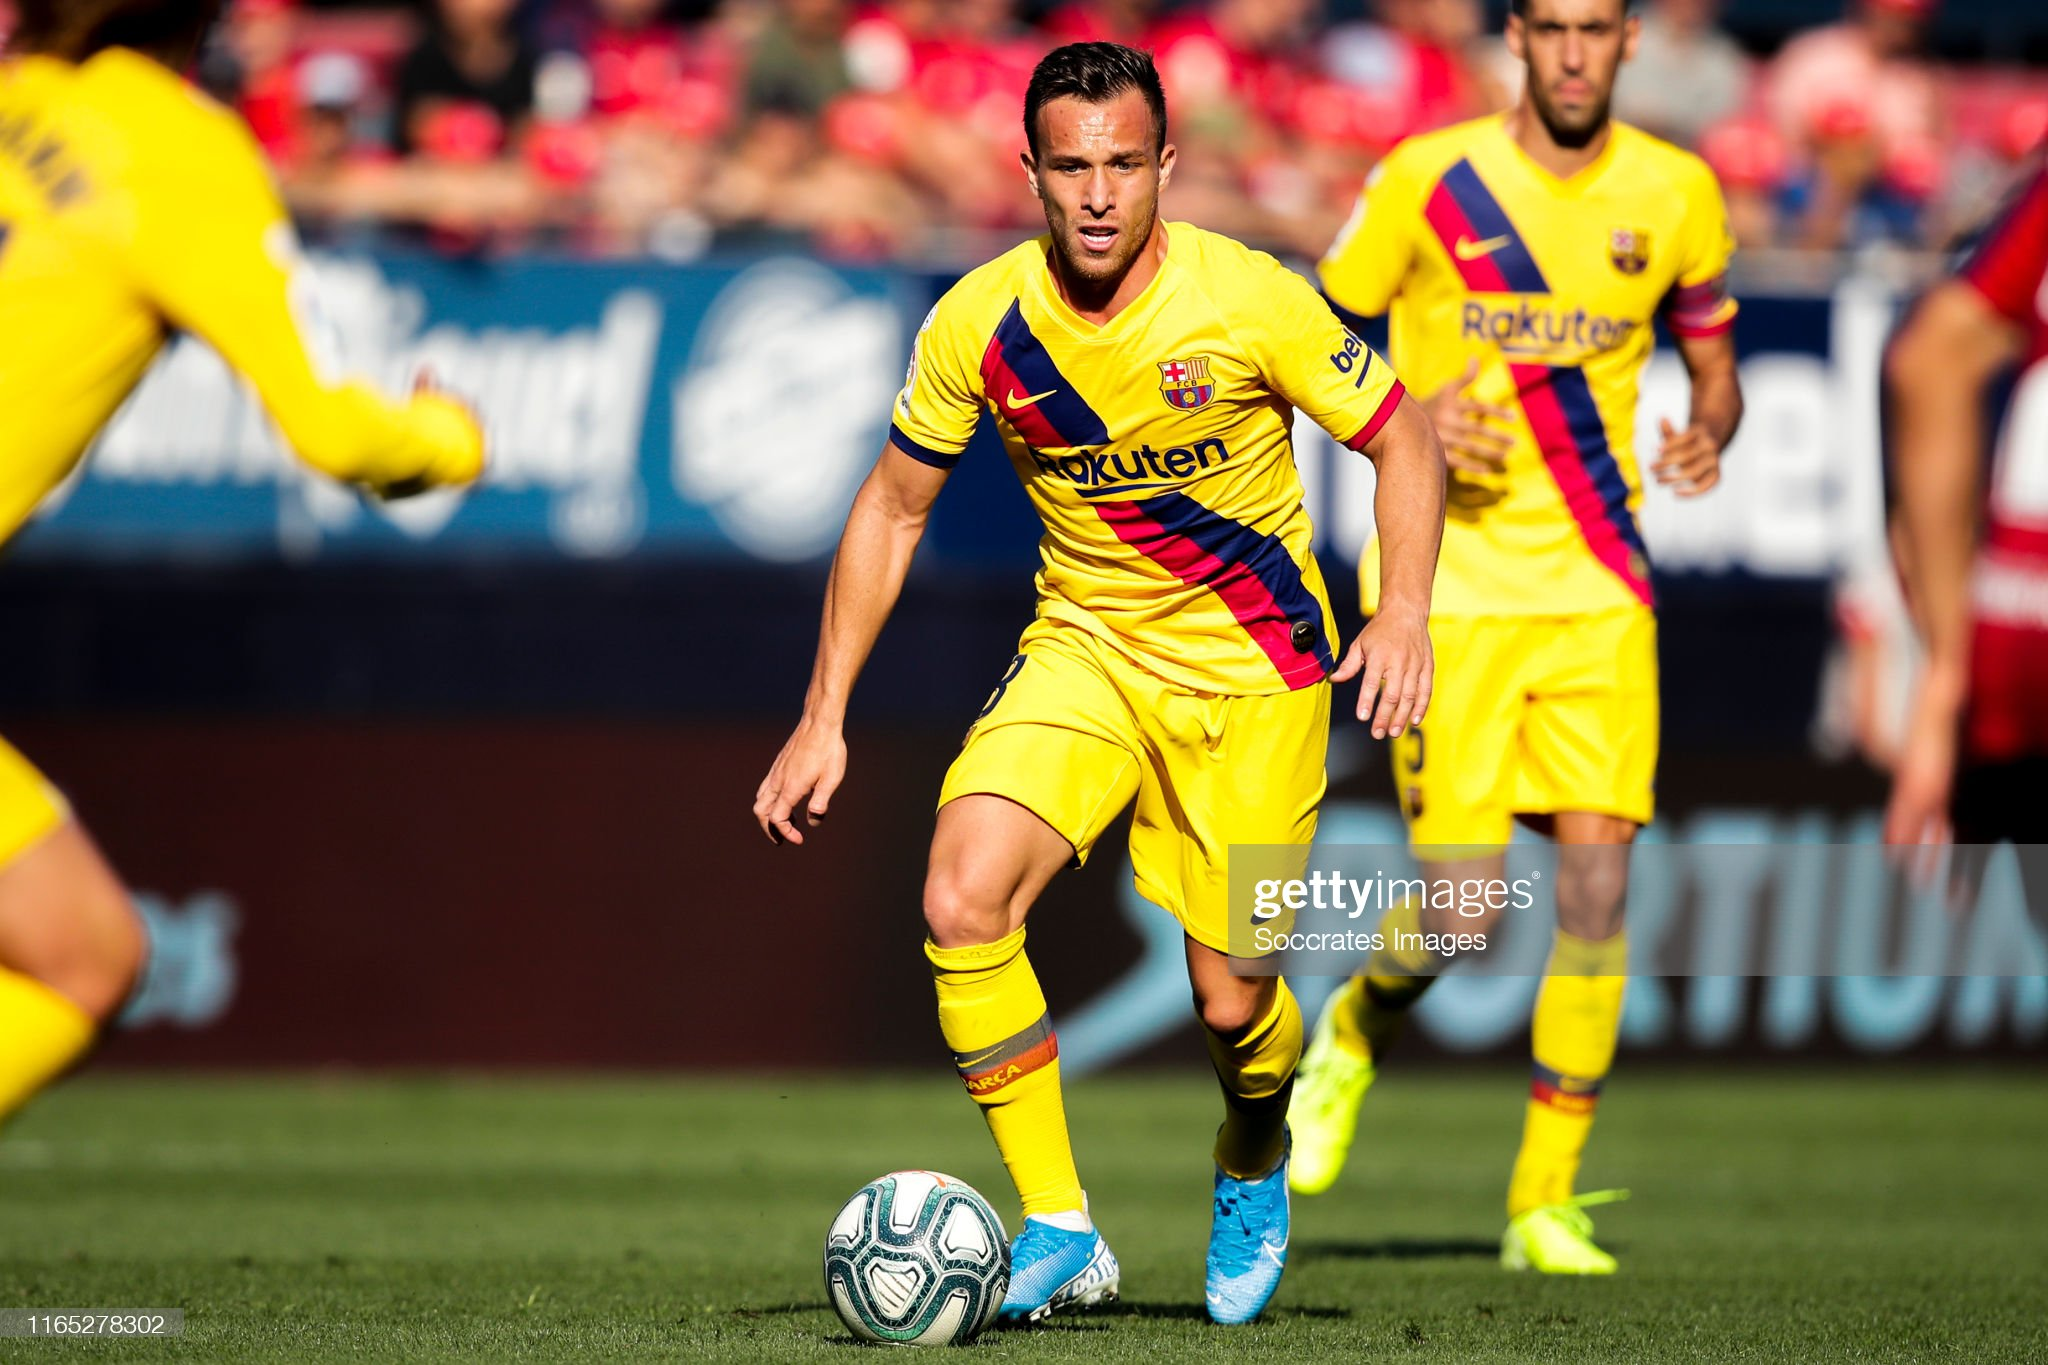 صور مباراة : أوساسونا - برشلونة 2-2 ( 31-08-2019 )  Arthur-of-fc-barcelona-during-the-la-liga-santander-match-between-v-picture-id1165278302?s=2048x2048